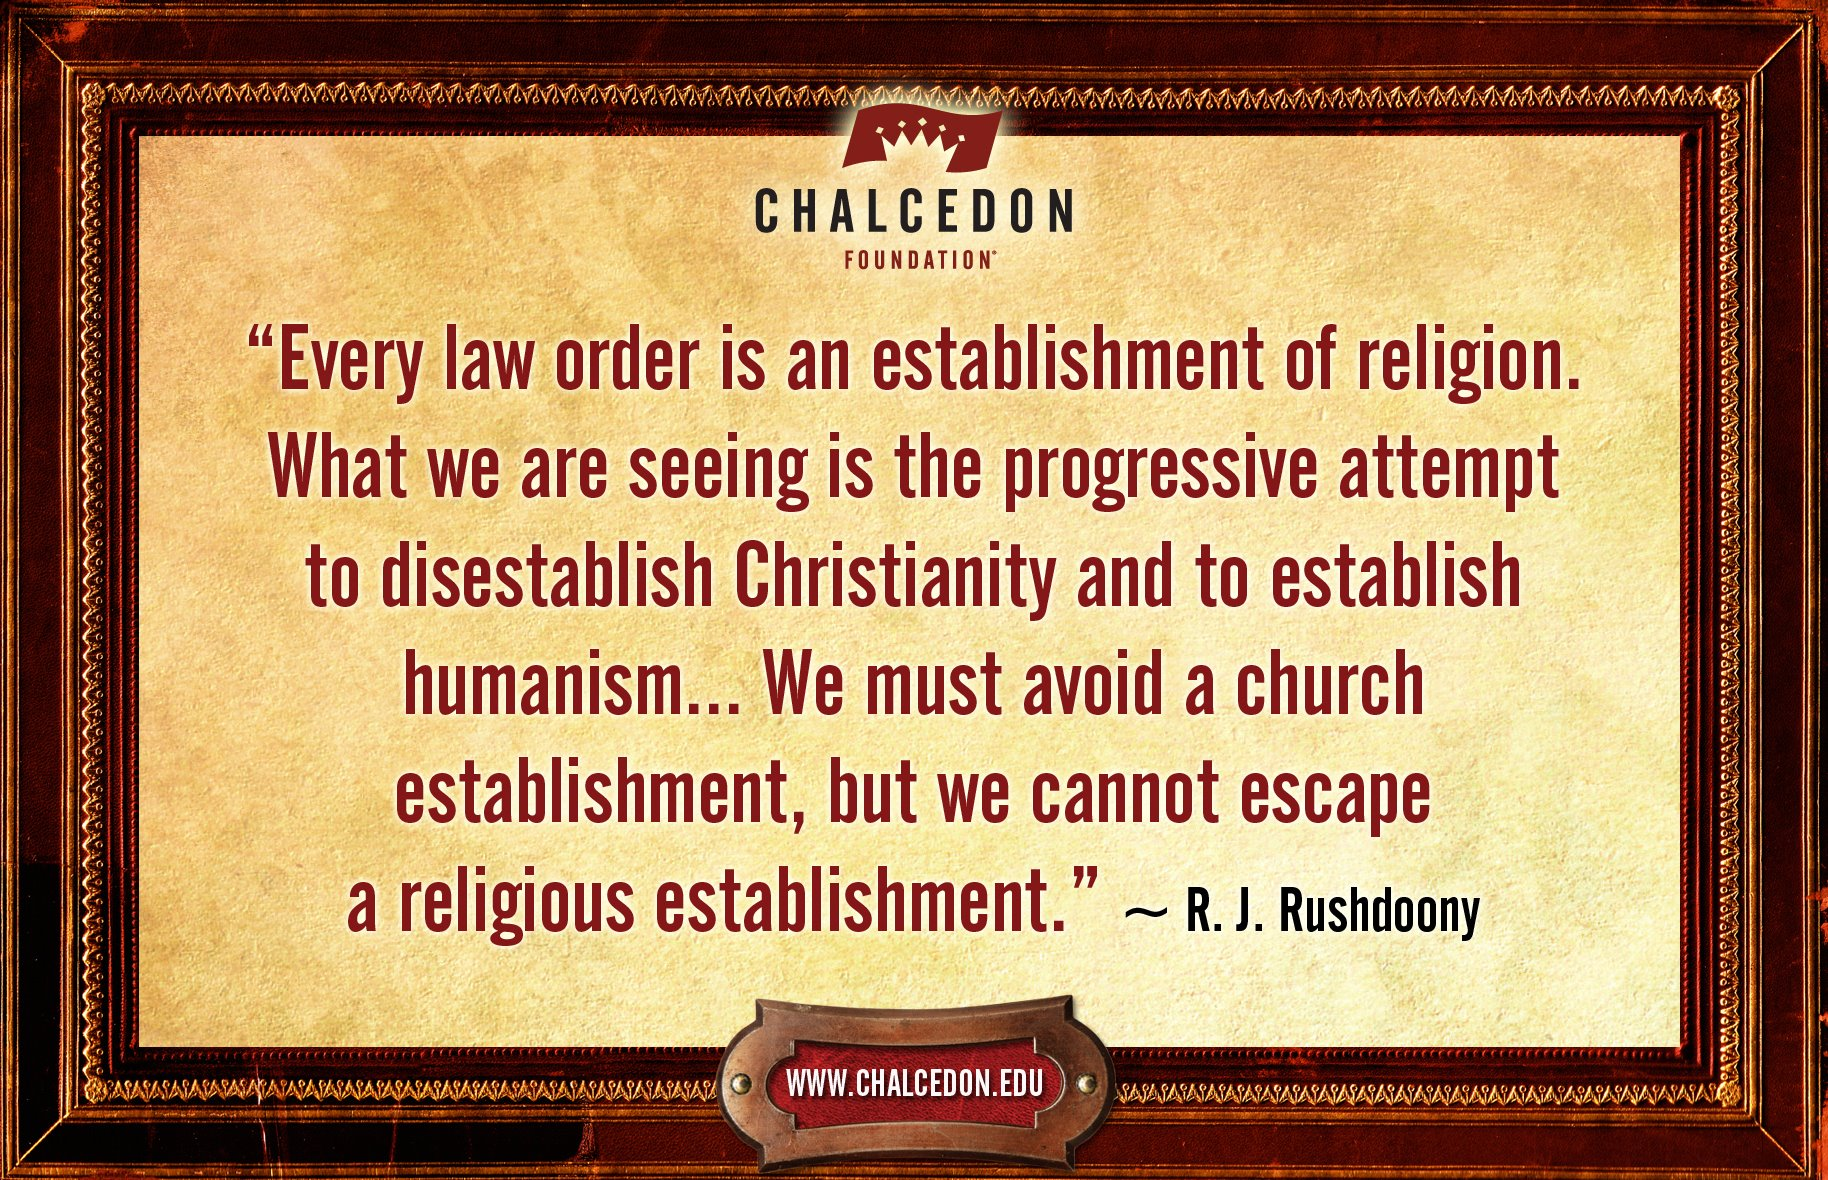 Establishment of Religion is Unescapable